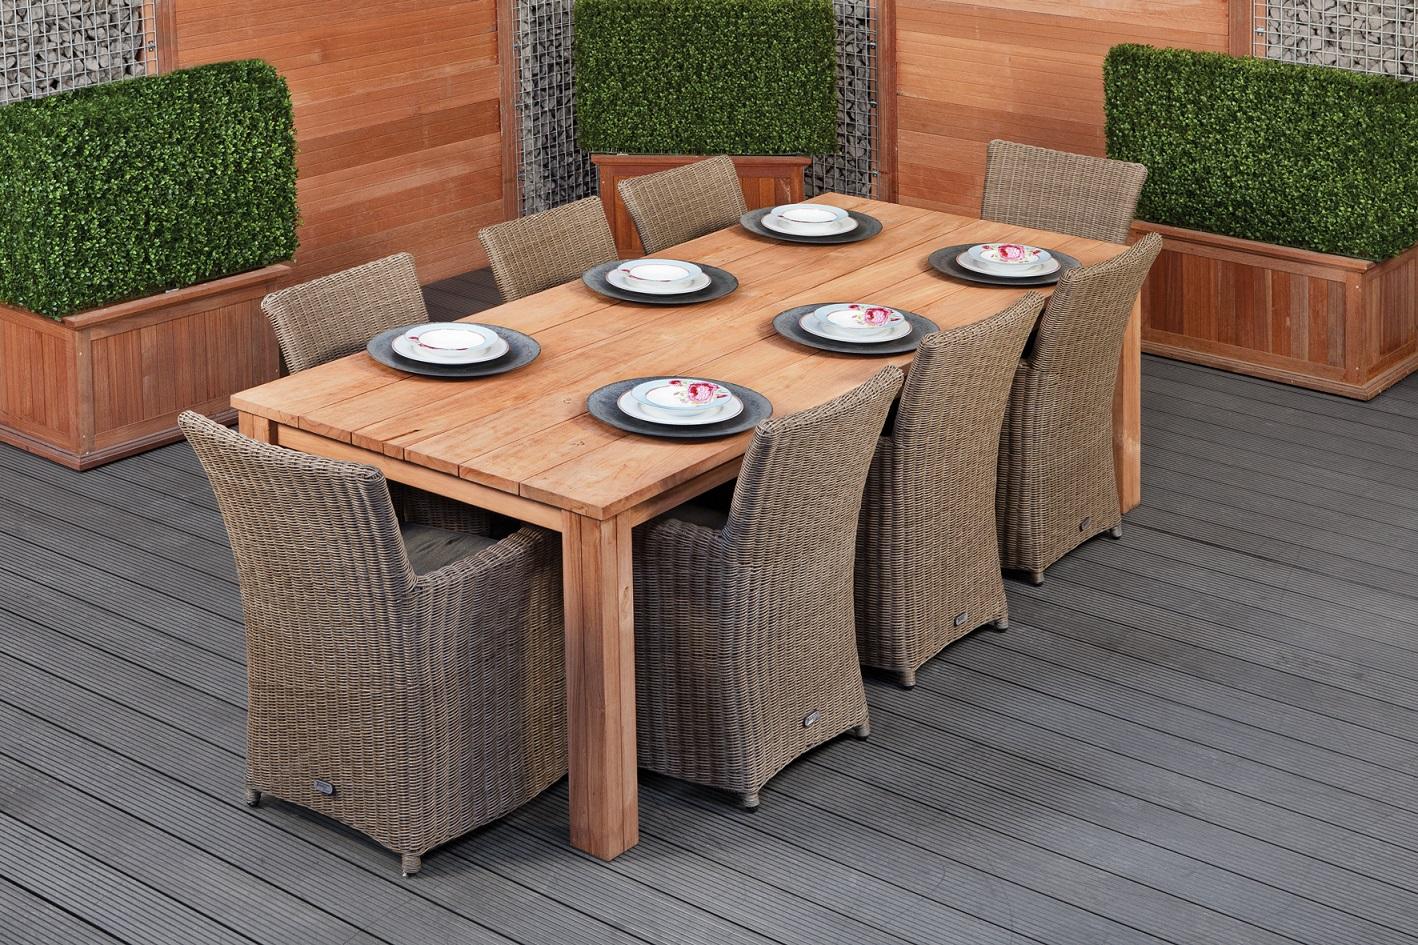 Teak dinner tafel Rustiek 300 | Tafel L300xB100xH80 cm